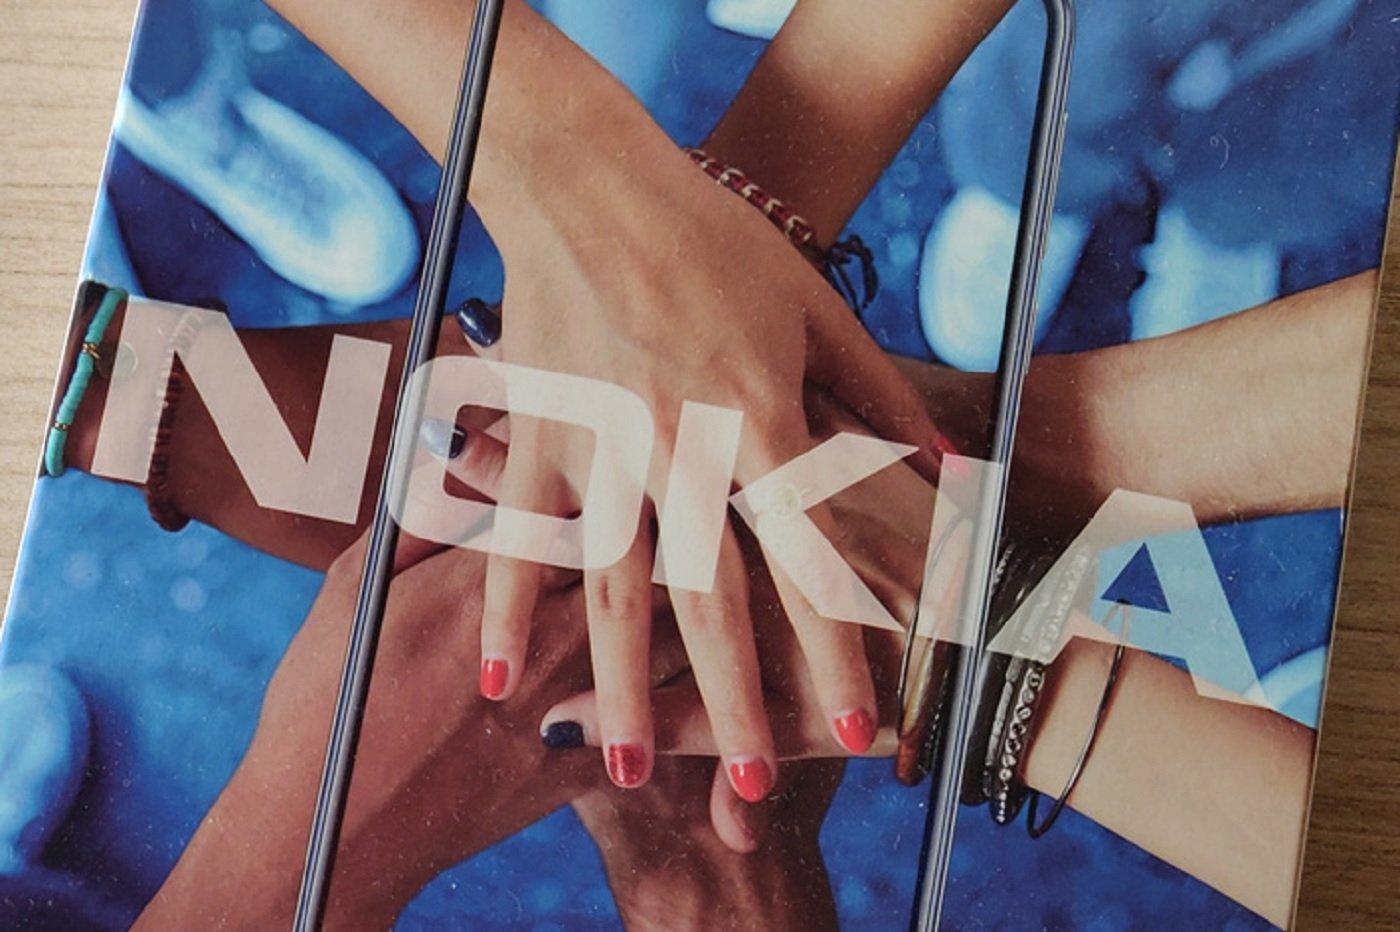 Le logo de Nokia sur un emballage